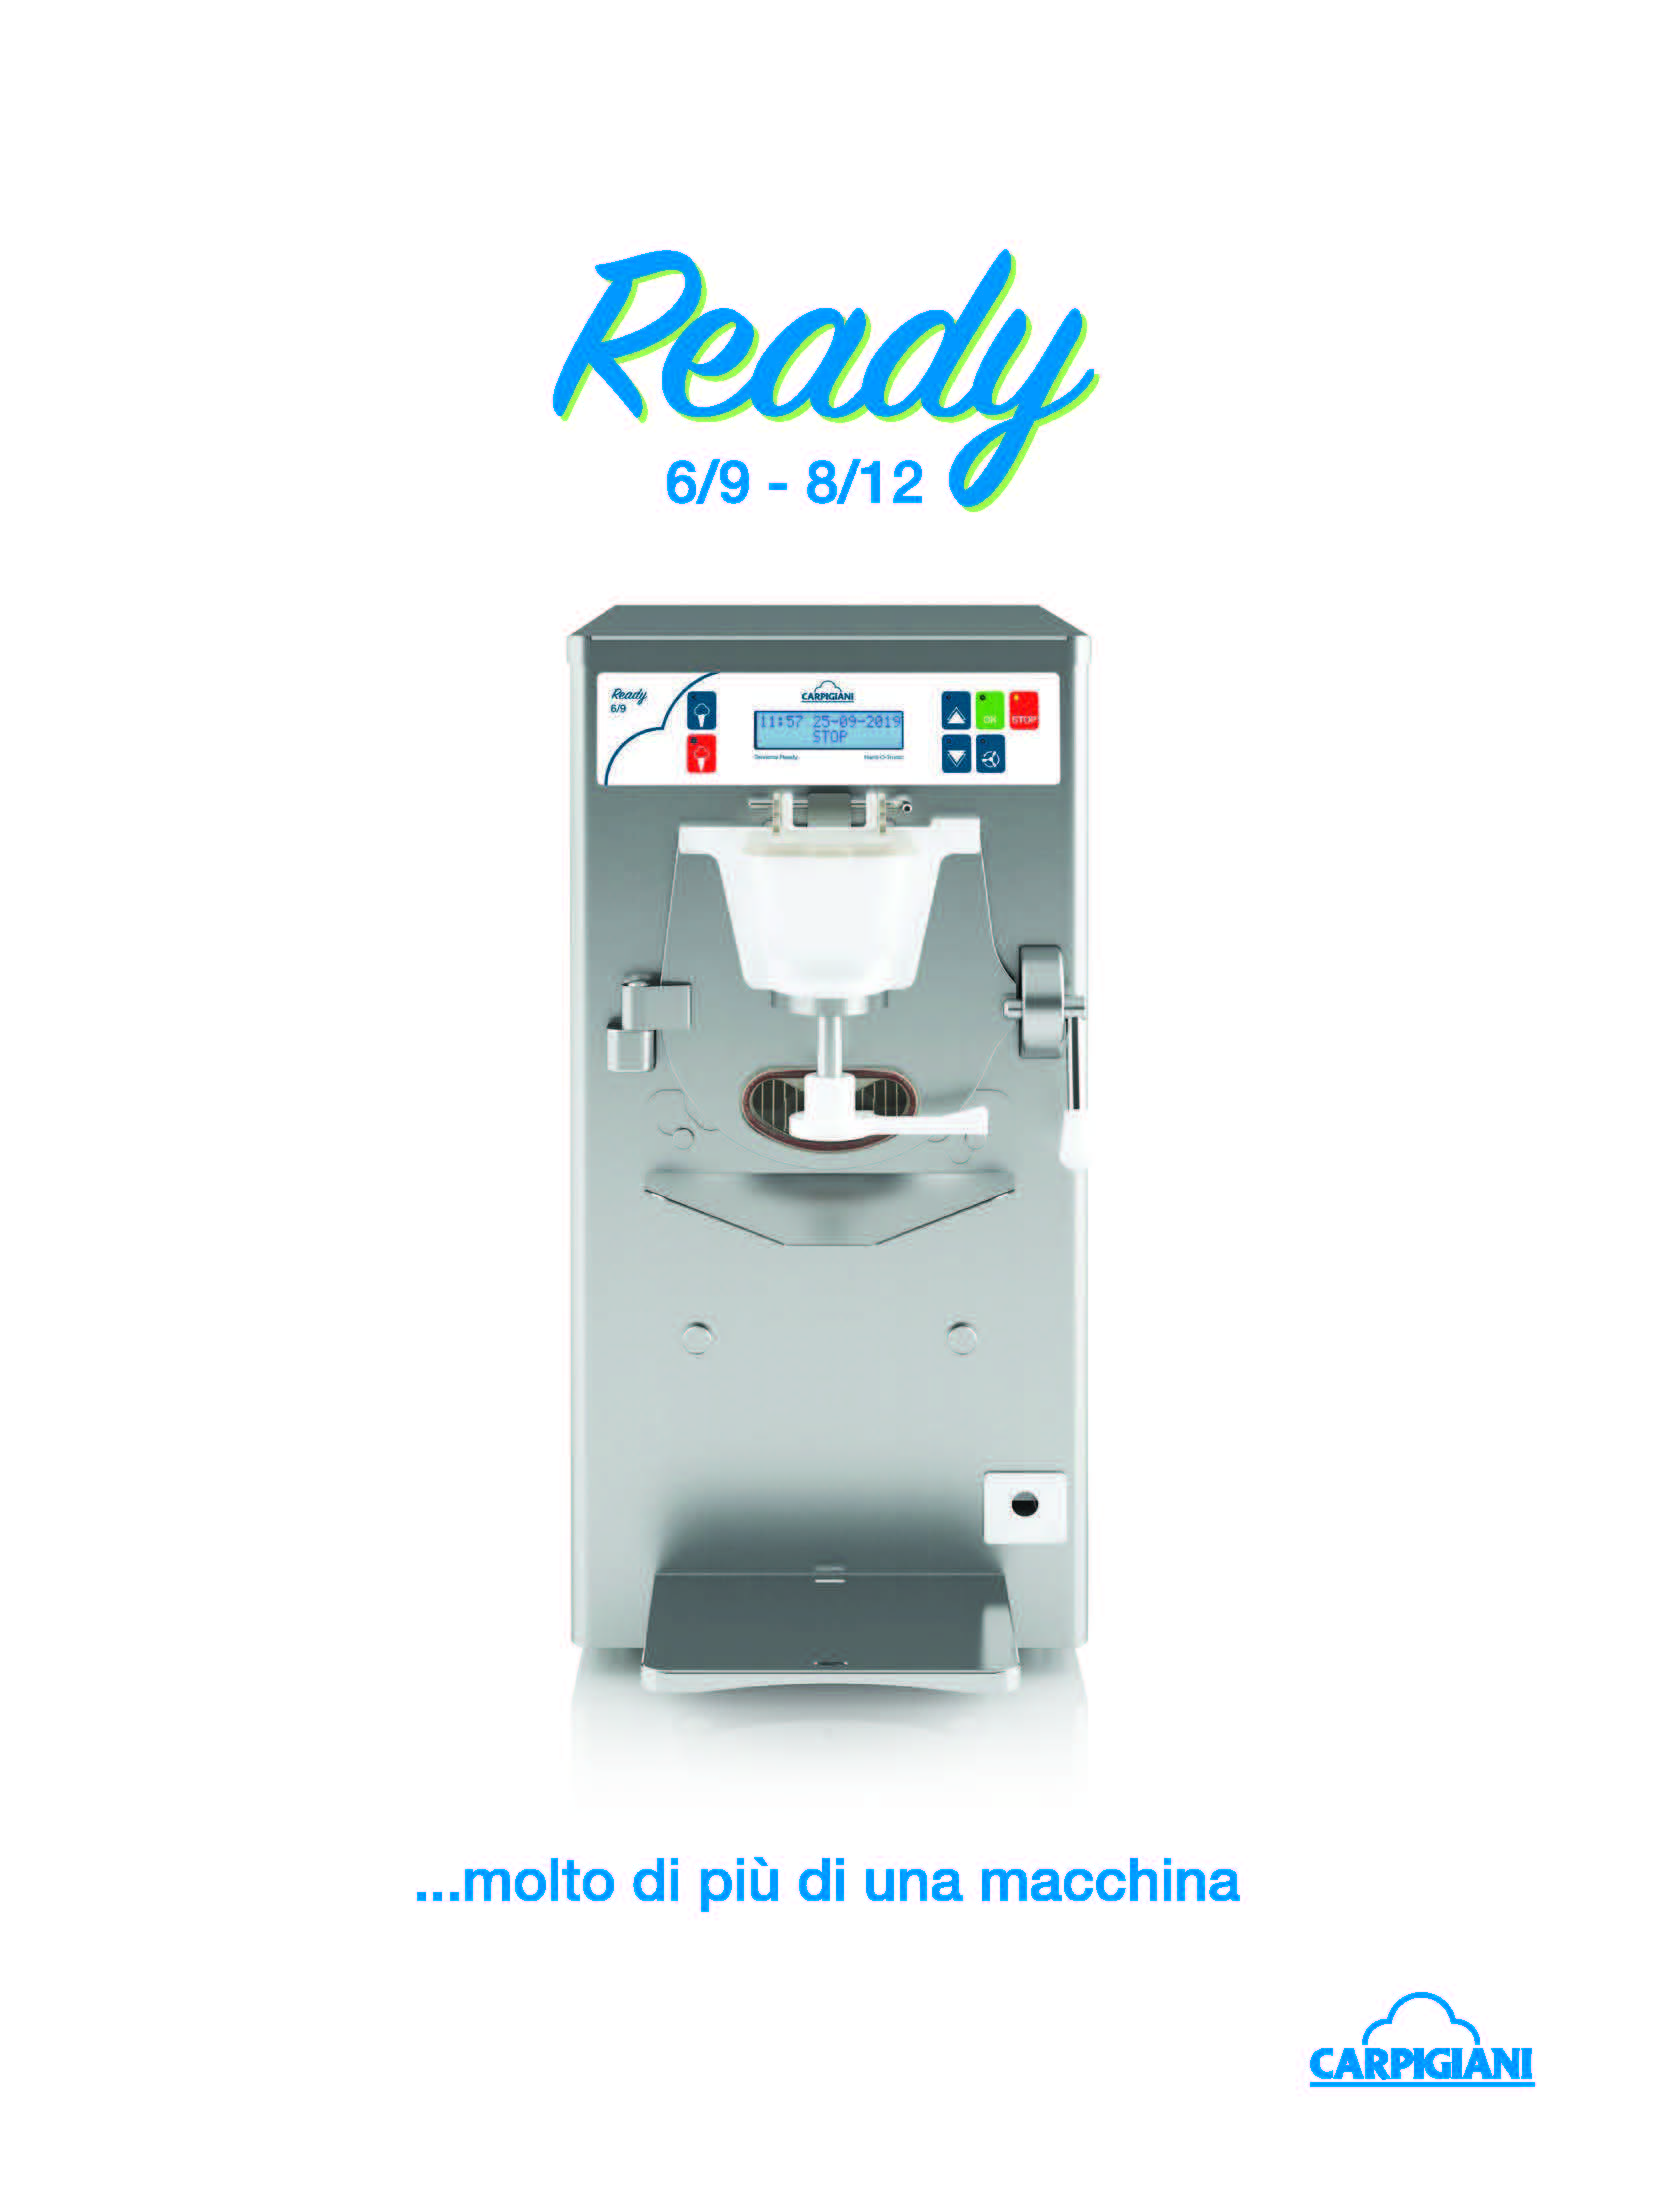 Carpigiani – Ready 6 9 8 12